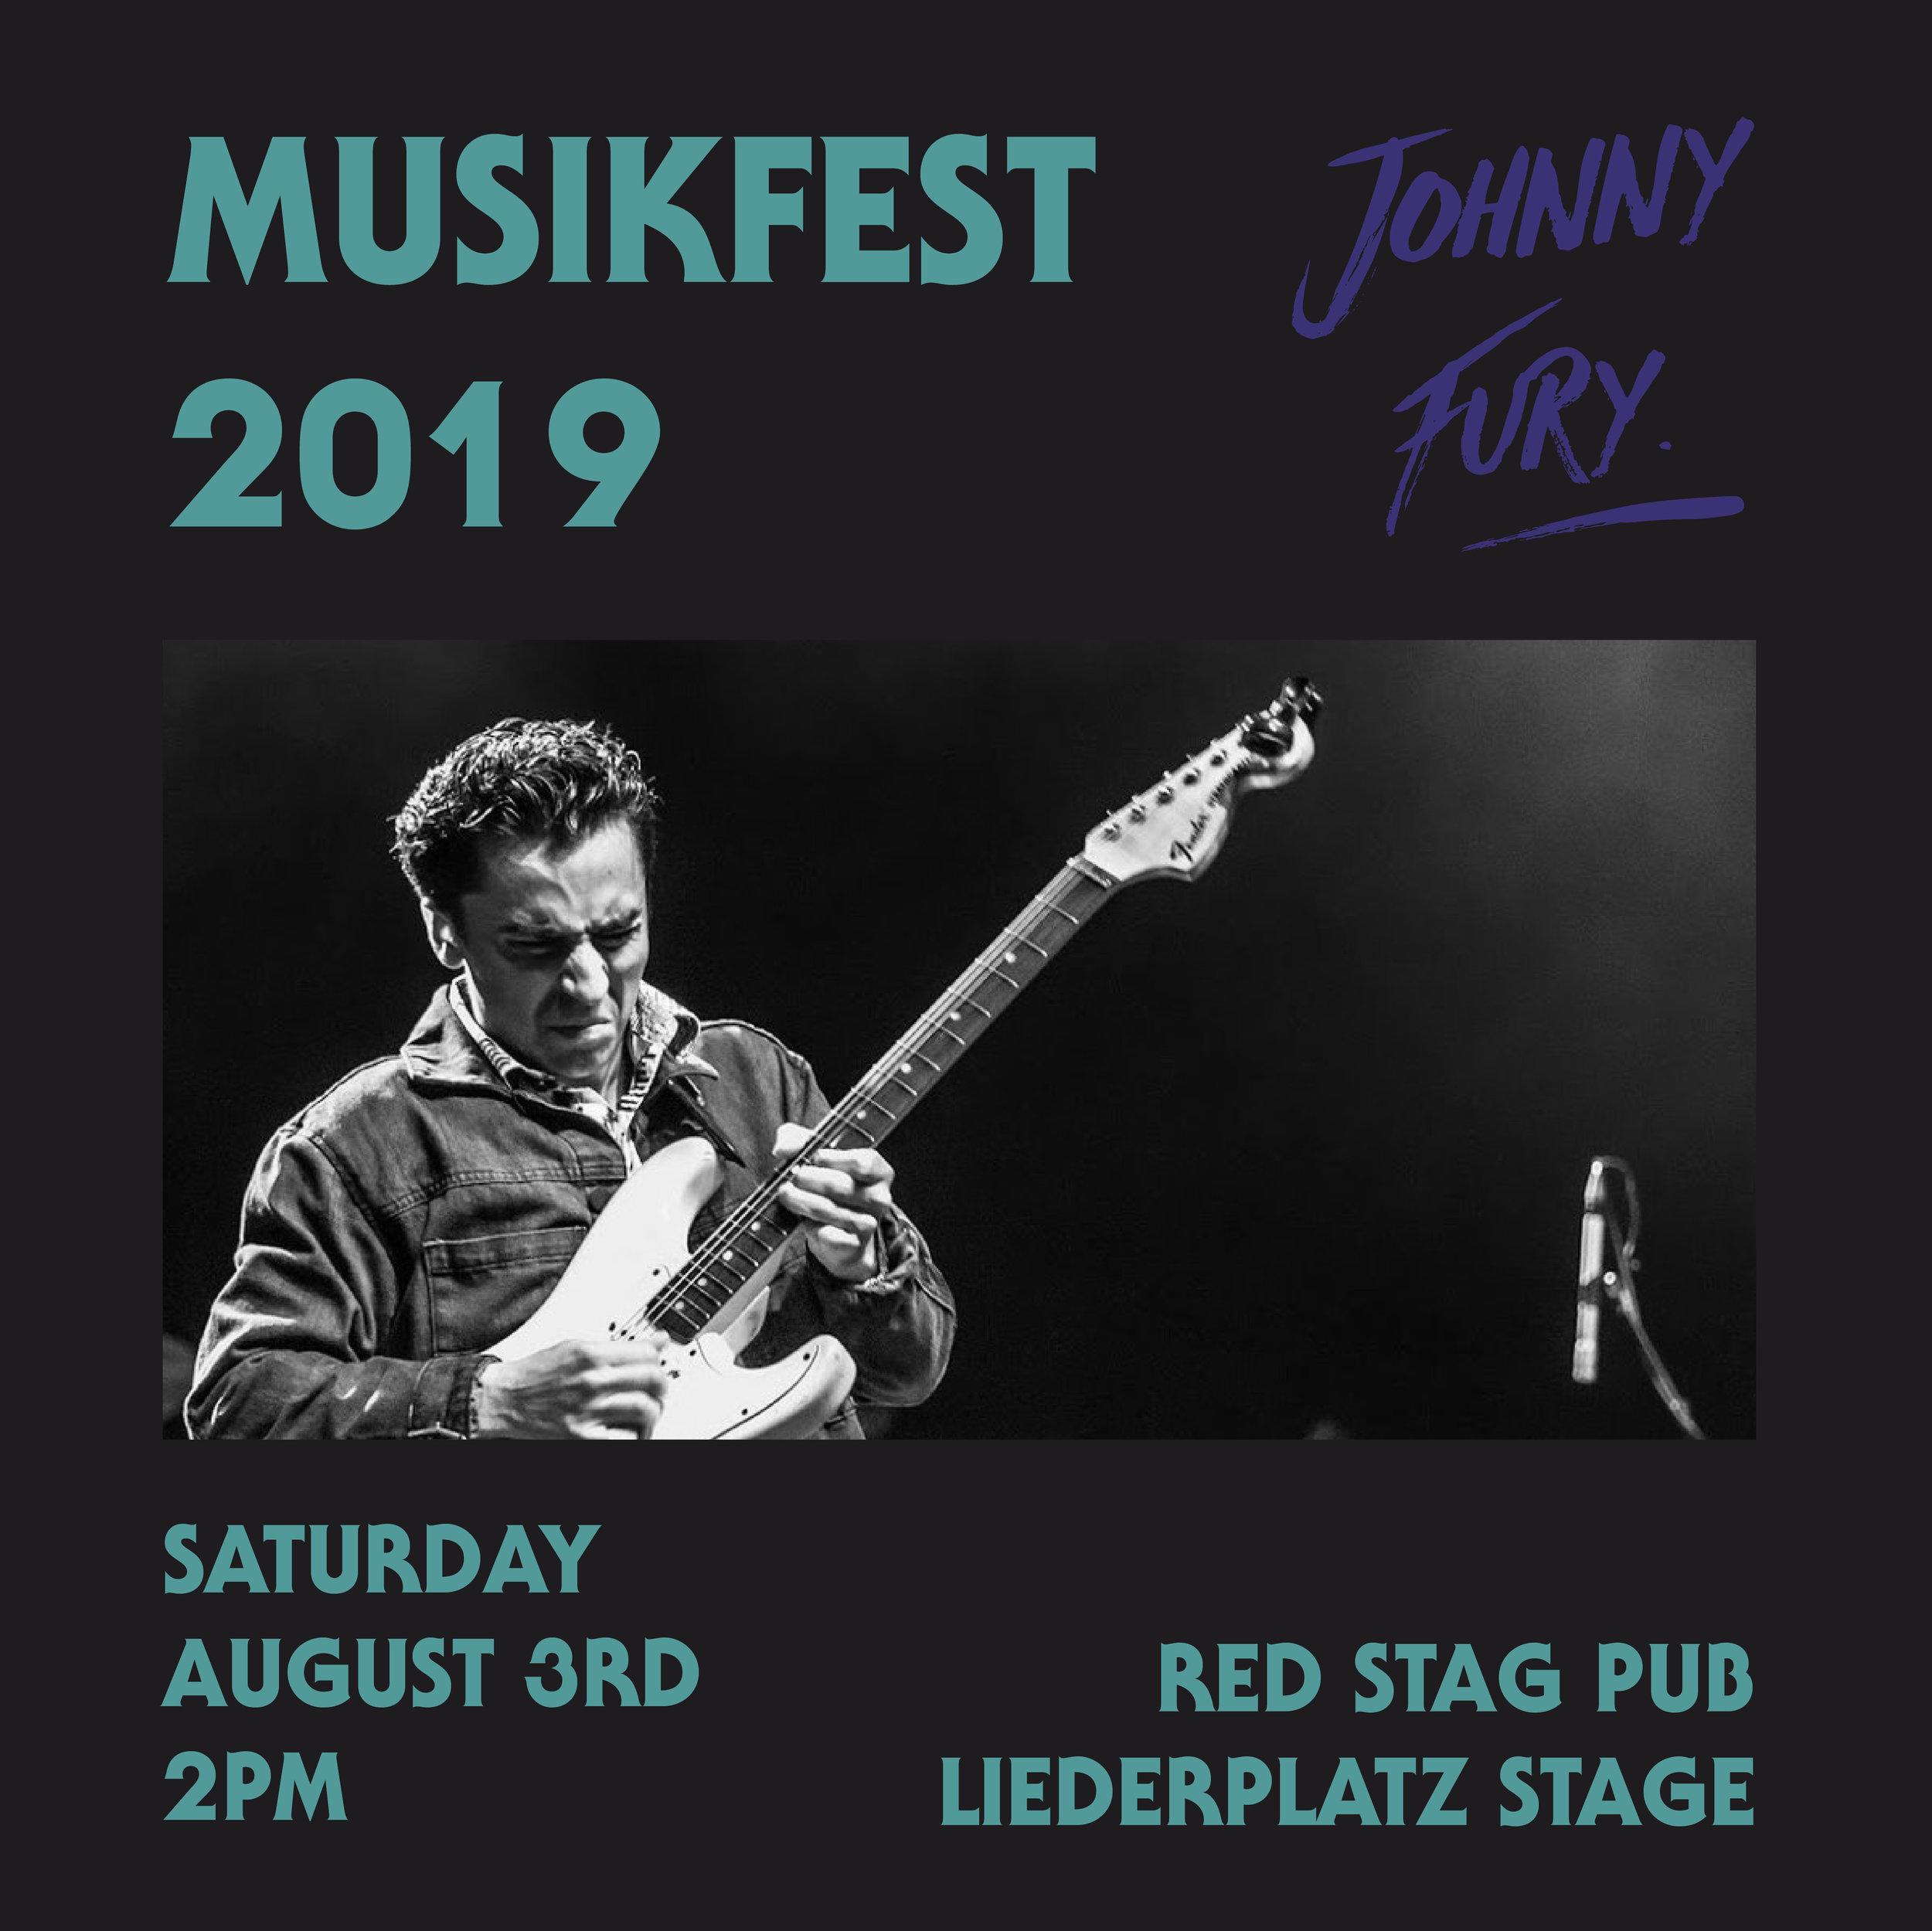 JohnnyFuryMusikfestPoster.jpg